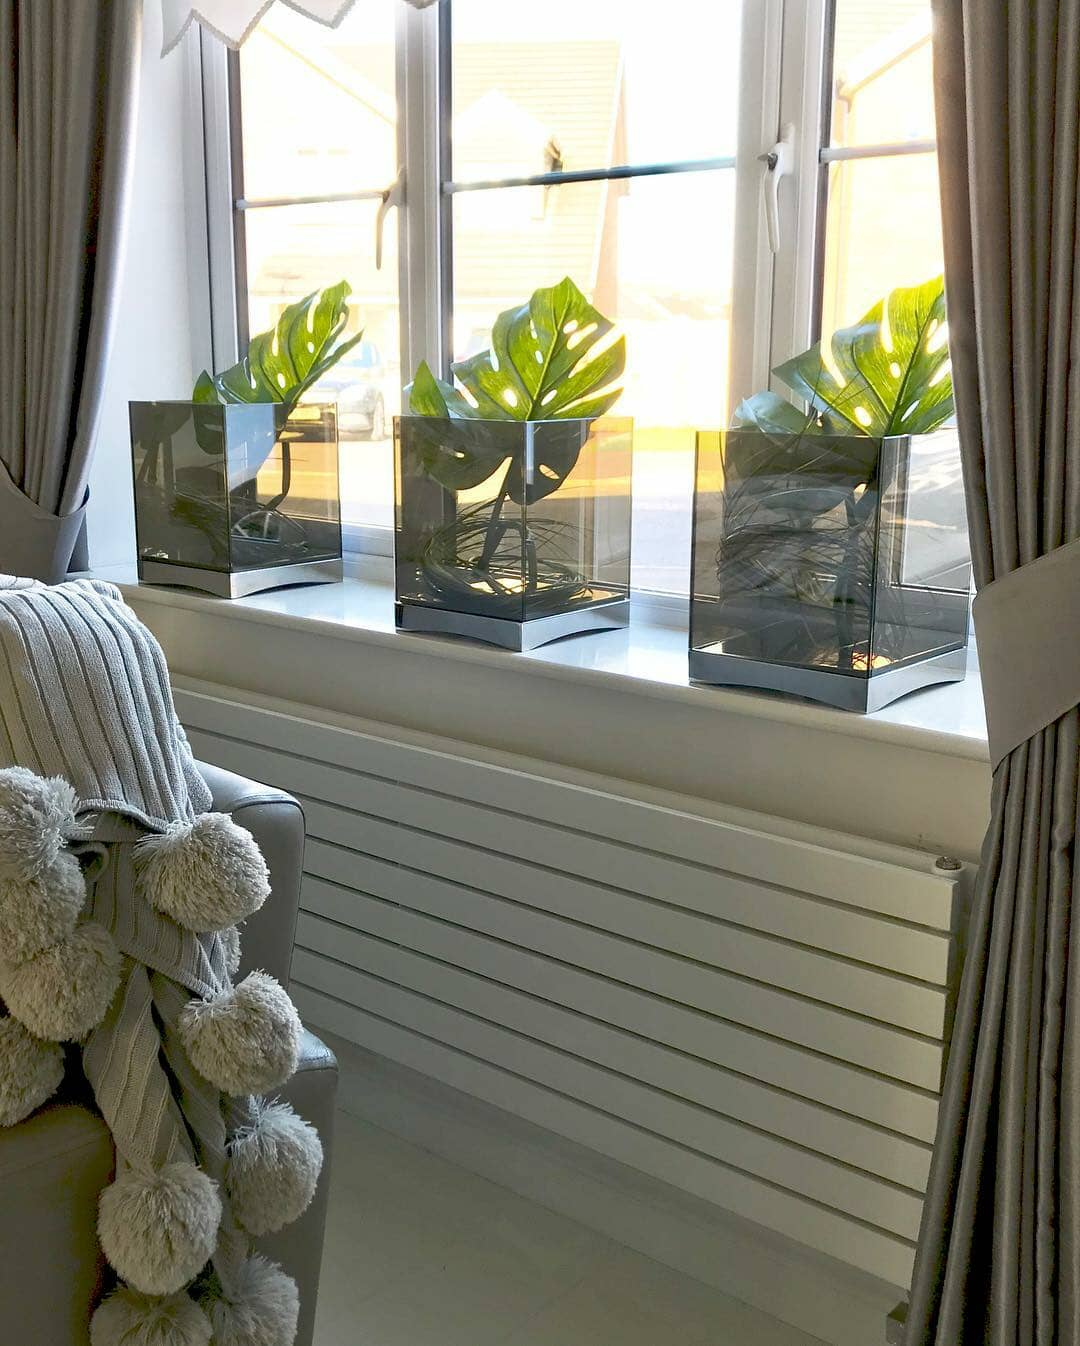 long white radiator under a window